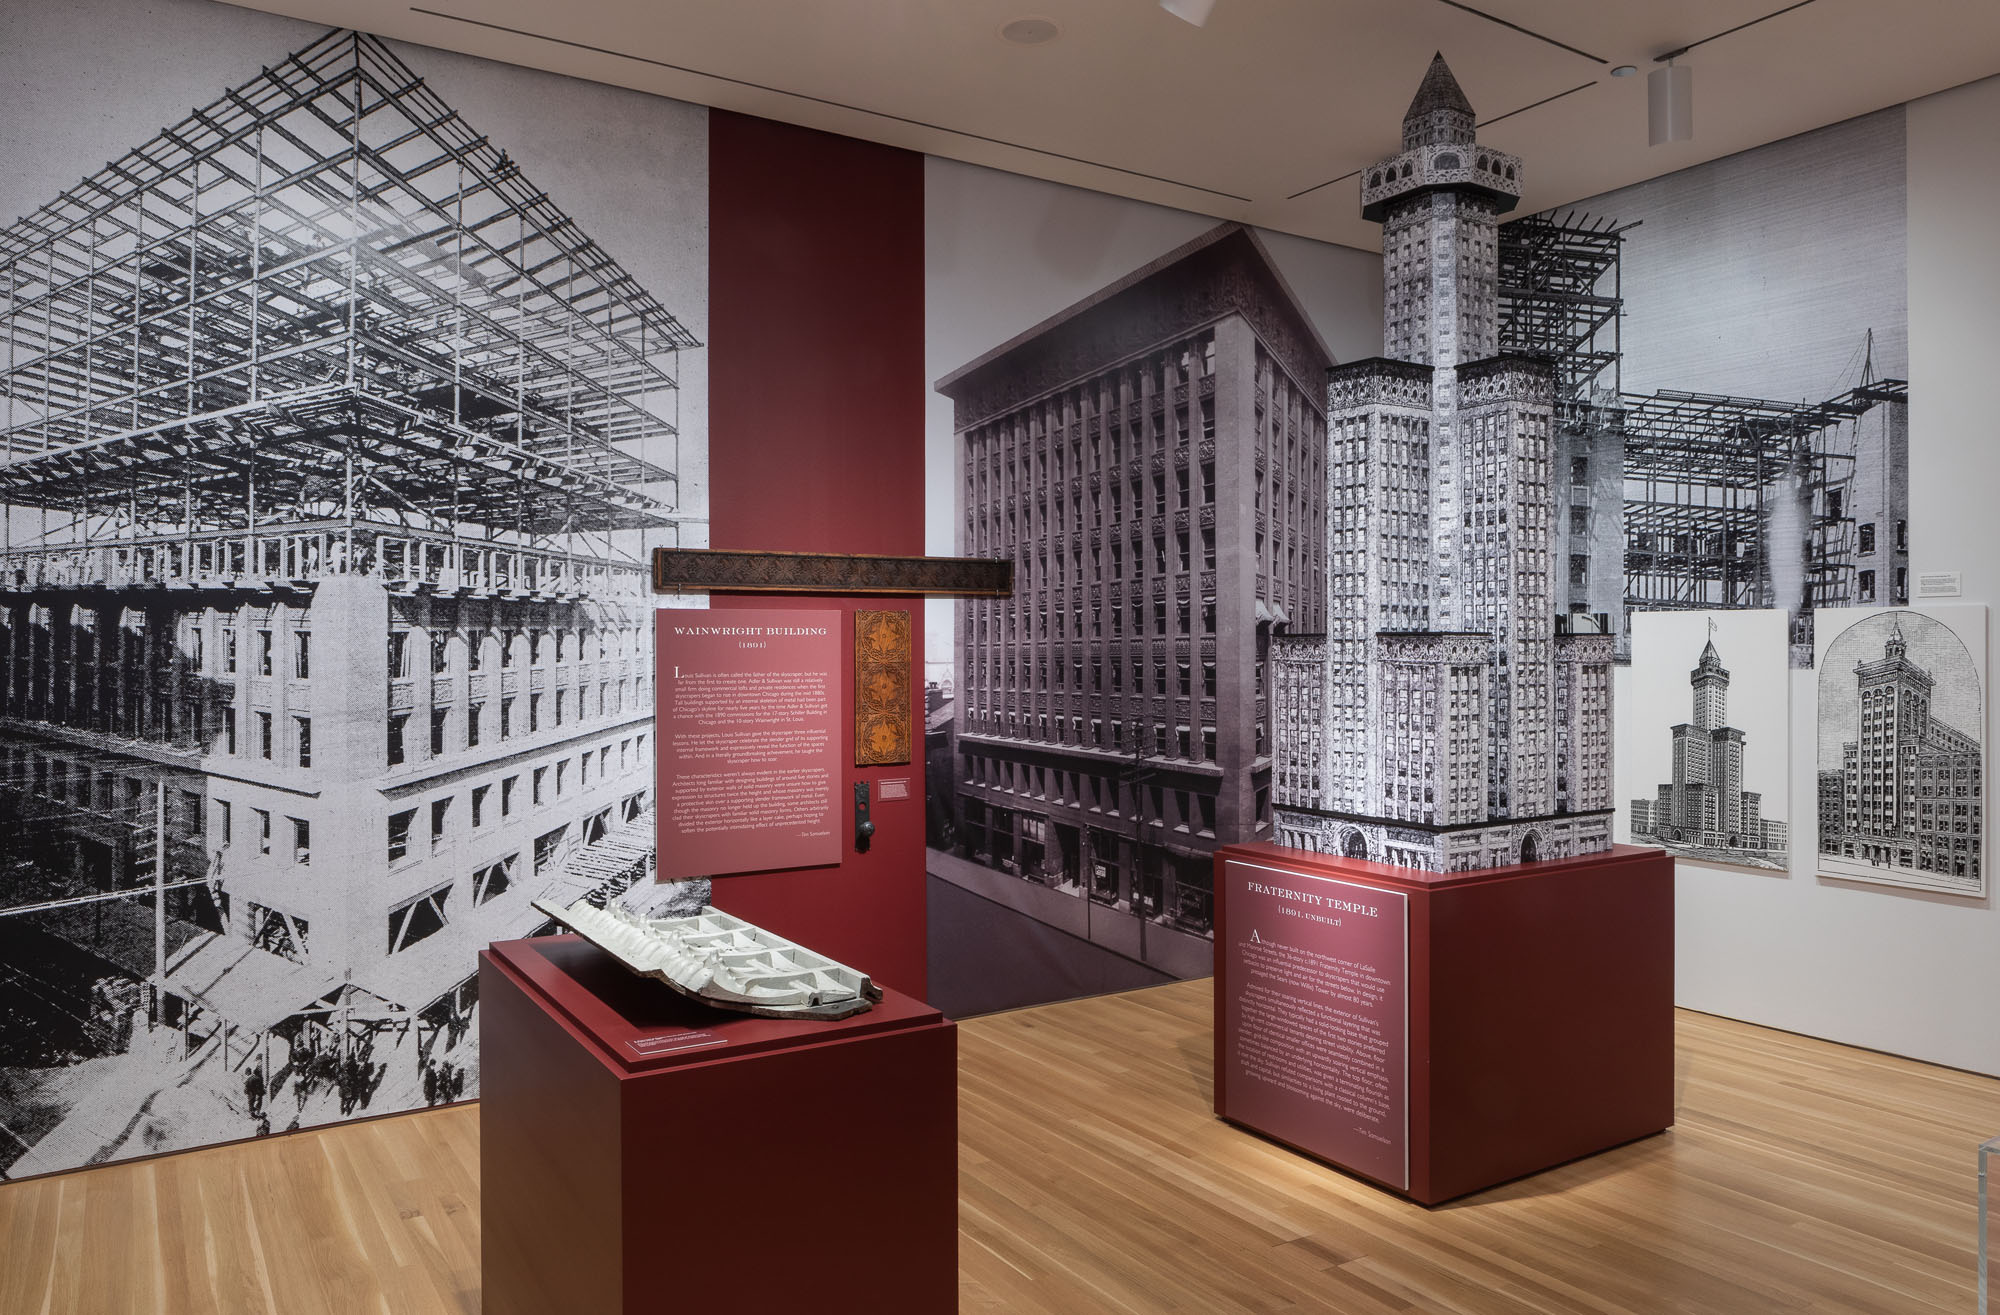 Exhibition view, Garrick Theater models